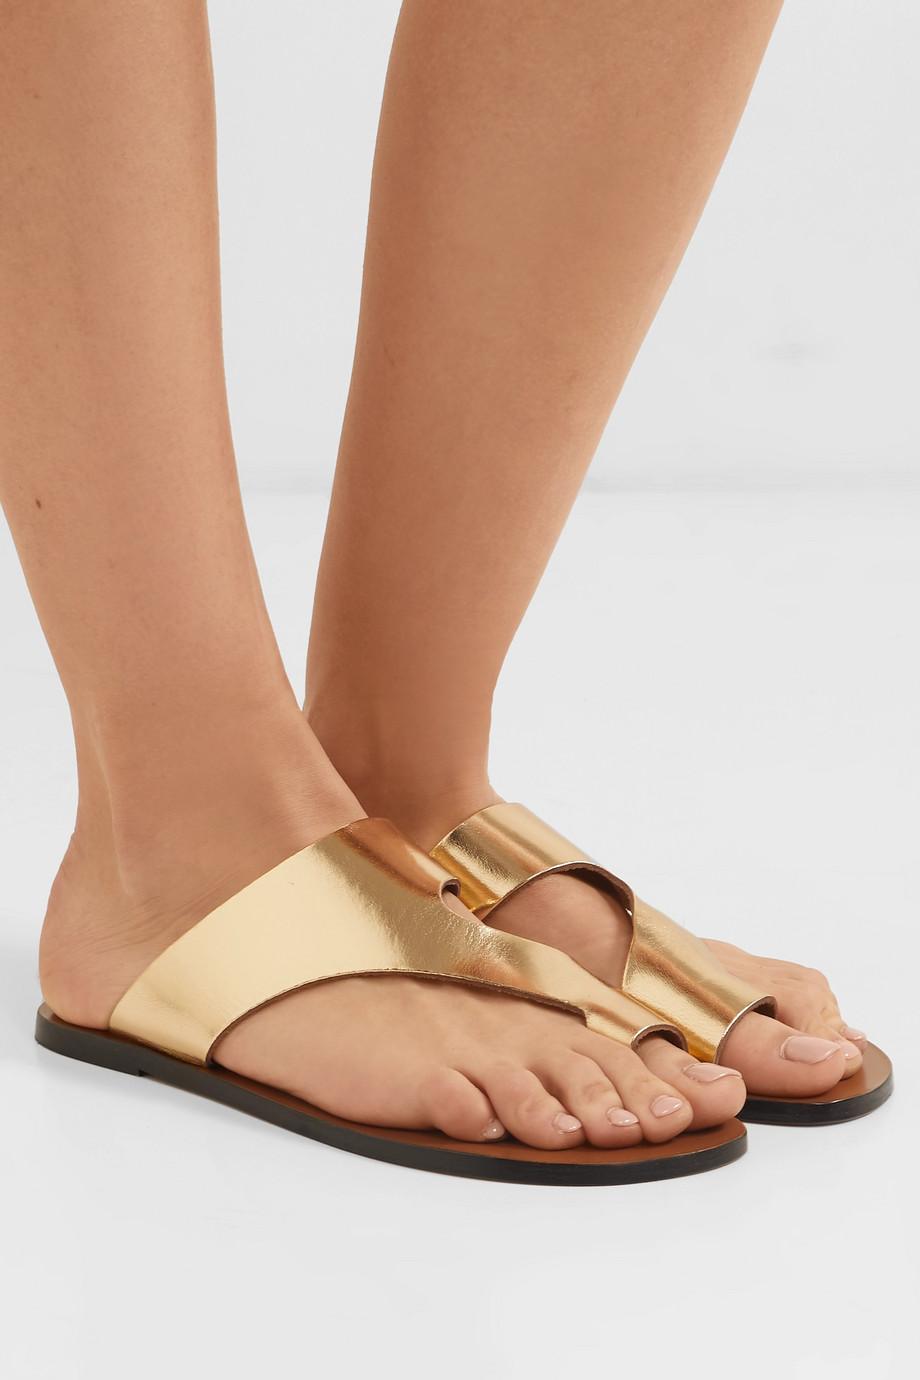 ATP Atelier Roma cutout metallic leather sandals